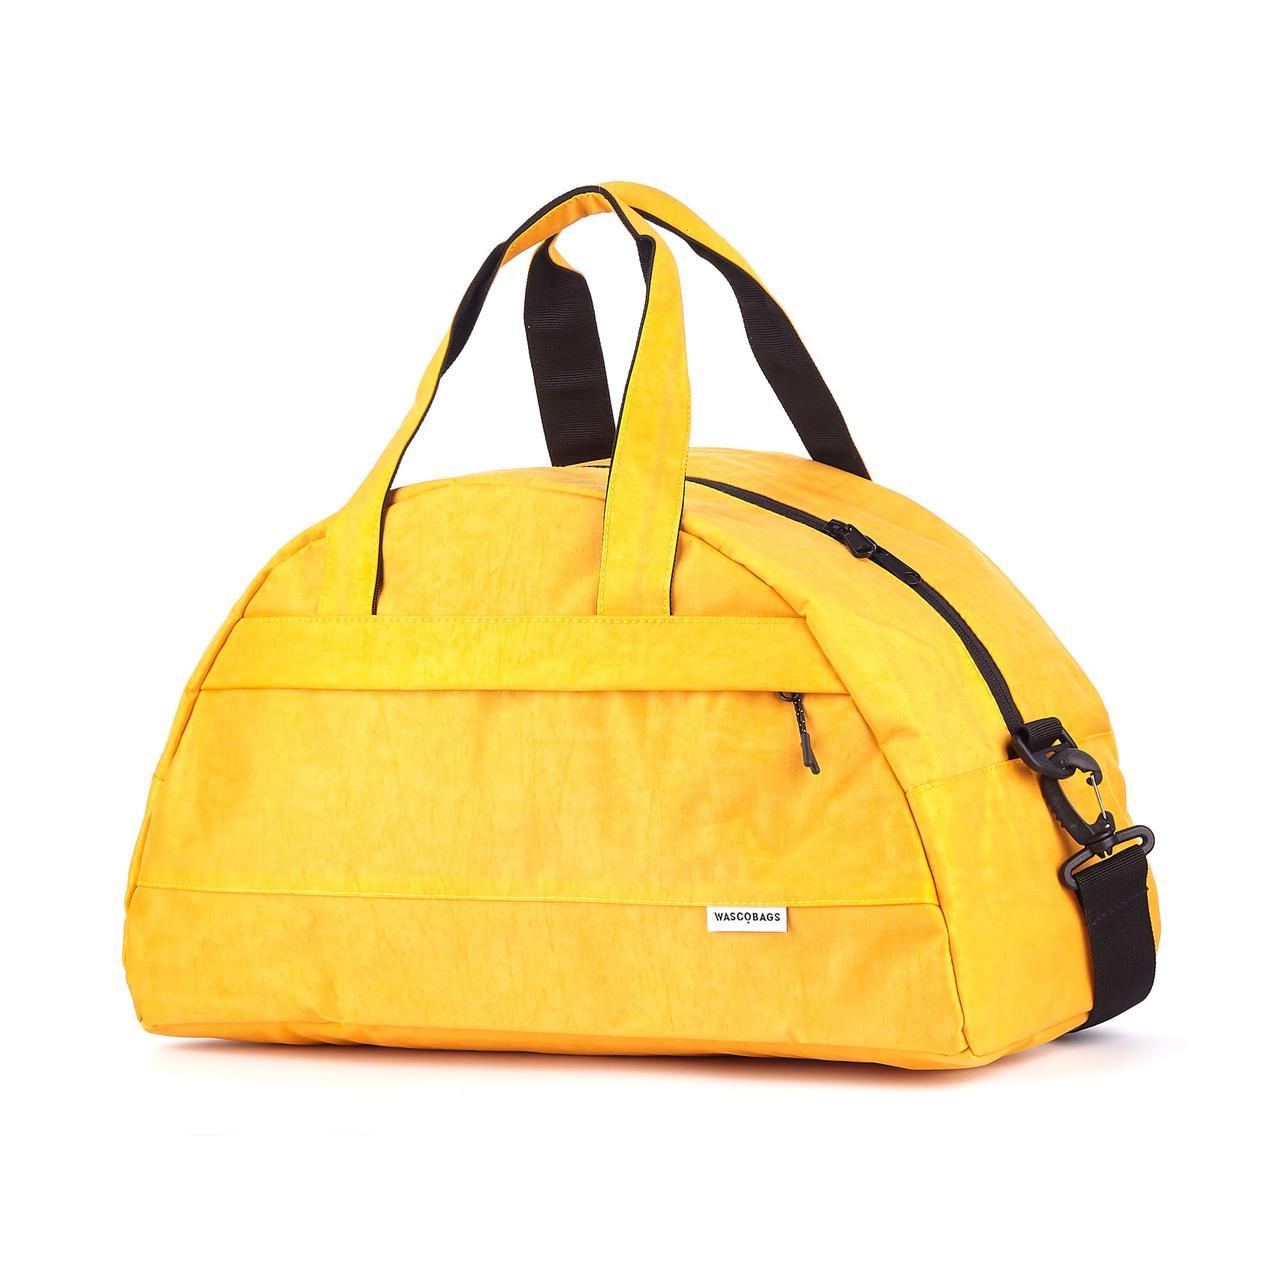 Дорожная сумка Wascobags Valencia Желтая (25 L)